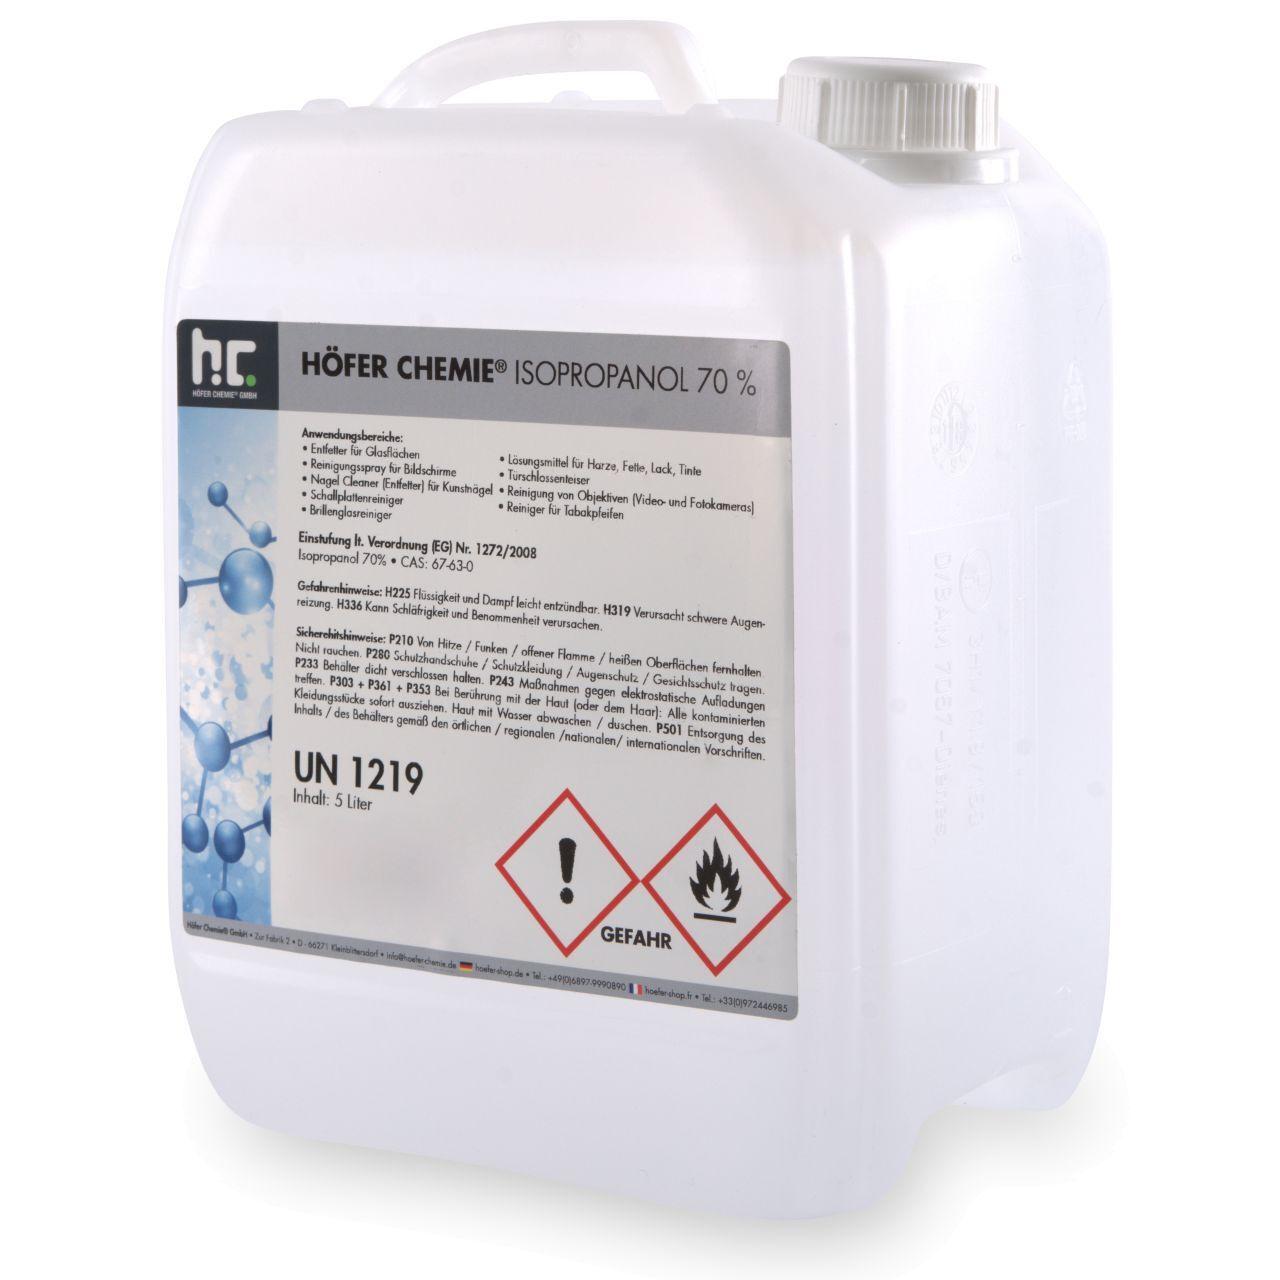 Höfer Chemie 5 l alcool isopropylique 70% (1 x 5 l)